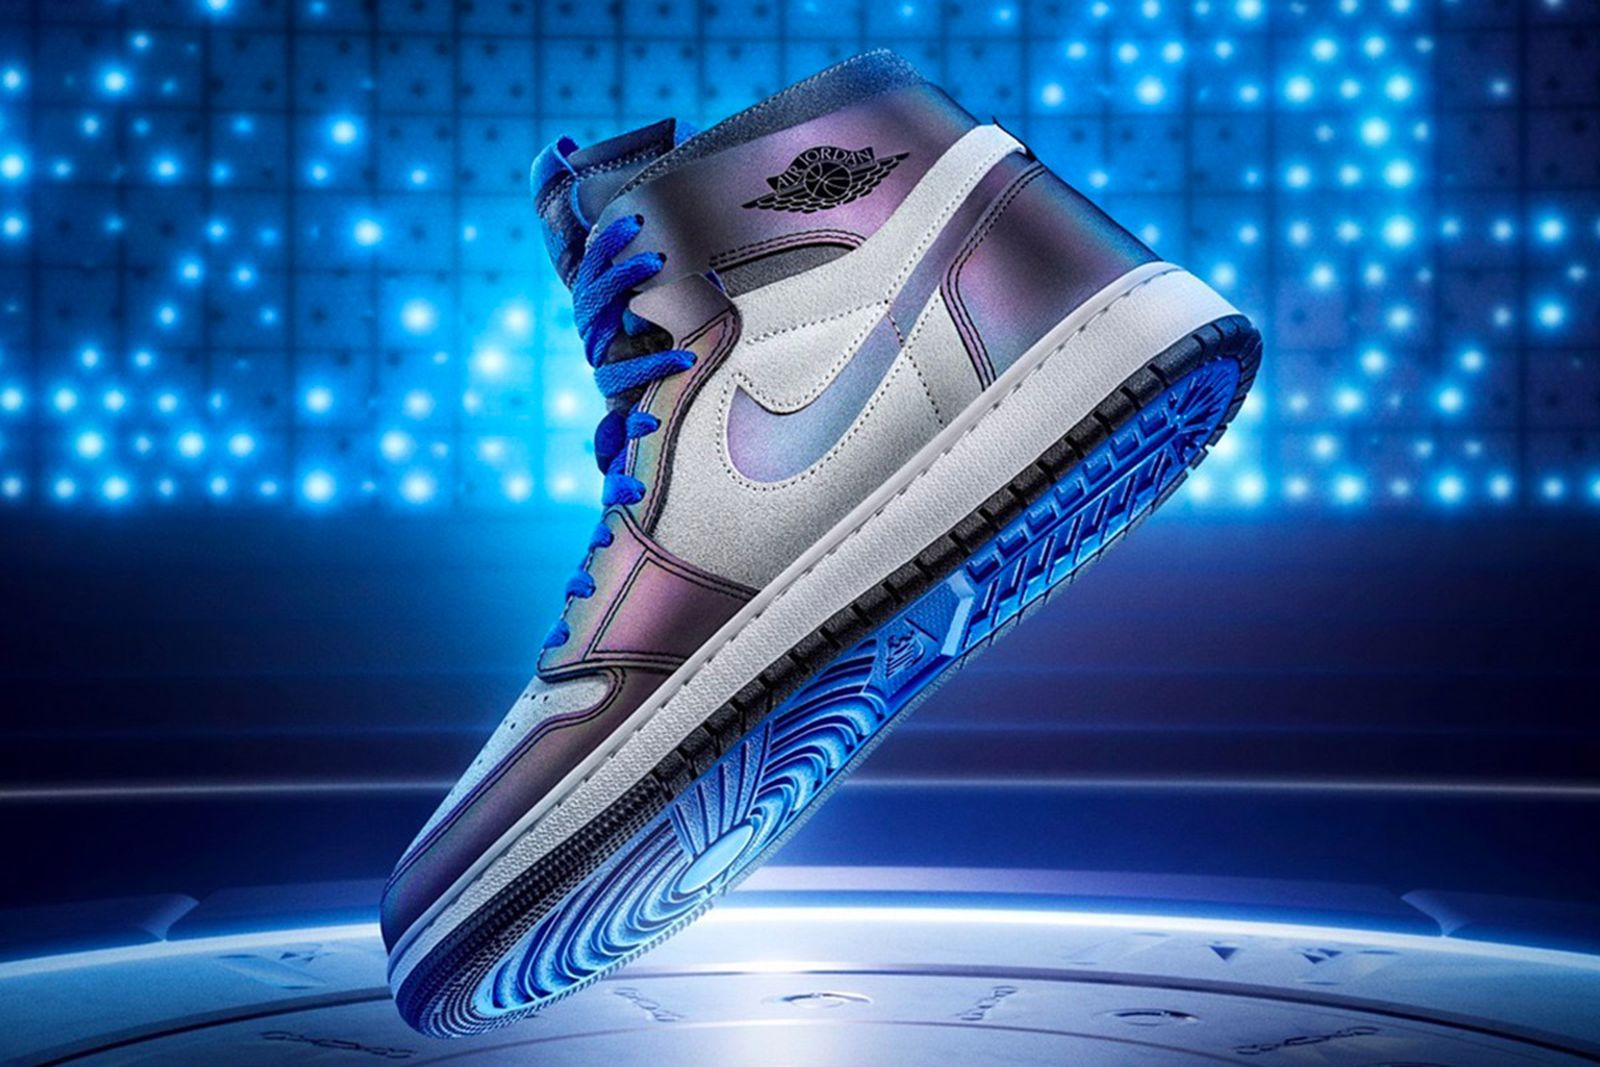 League of Legends x Nike Air Jordan 1 Zoom: Images & Rumored Info